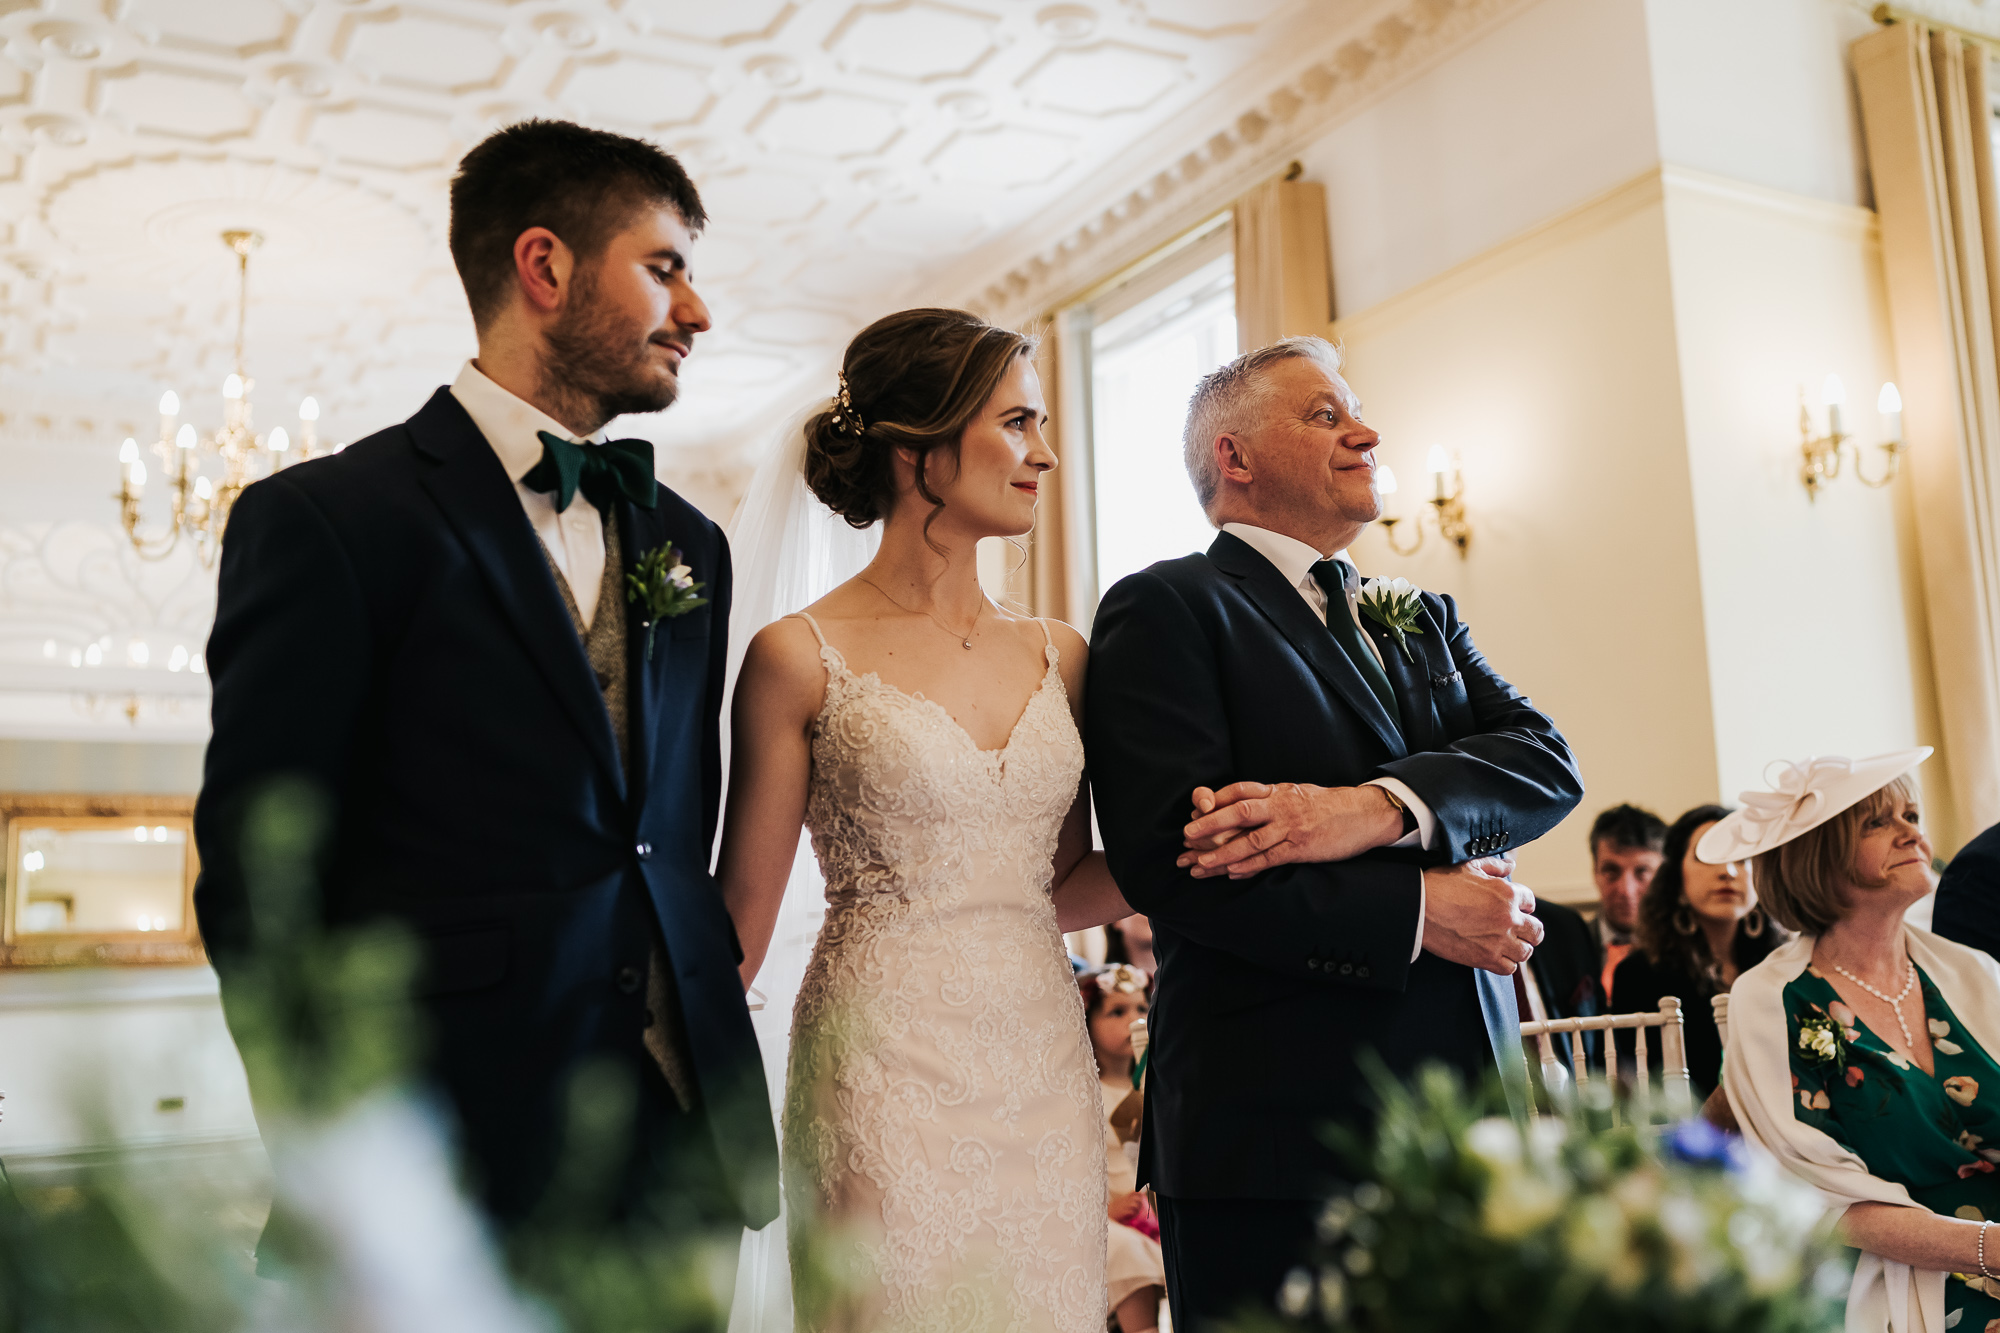 Nunsmere Hall Hotel Wedding photograhpy in cheshire wedding photographer (17 of 42).jpg